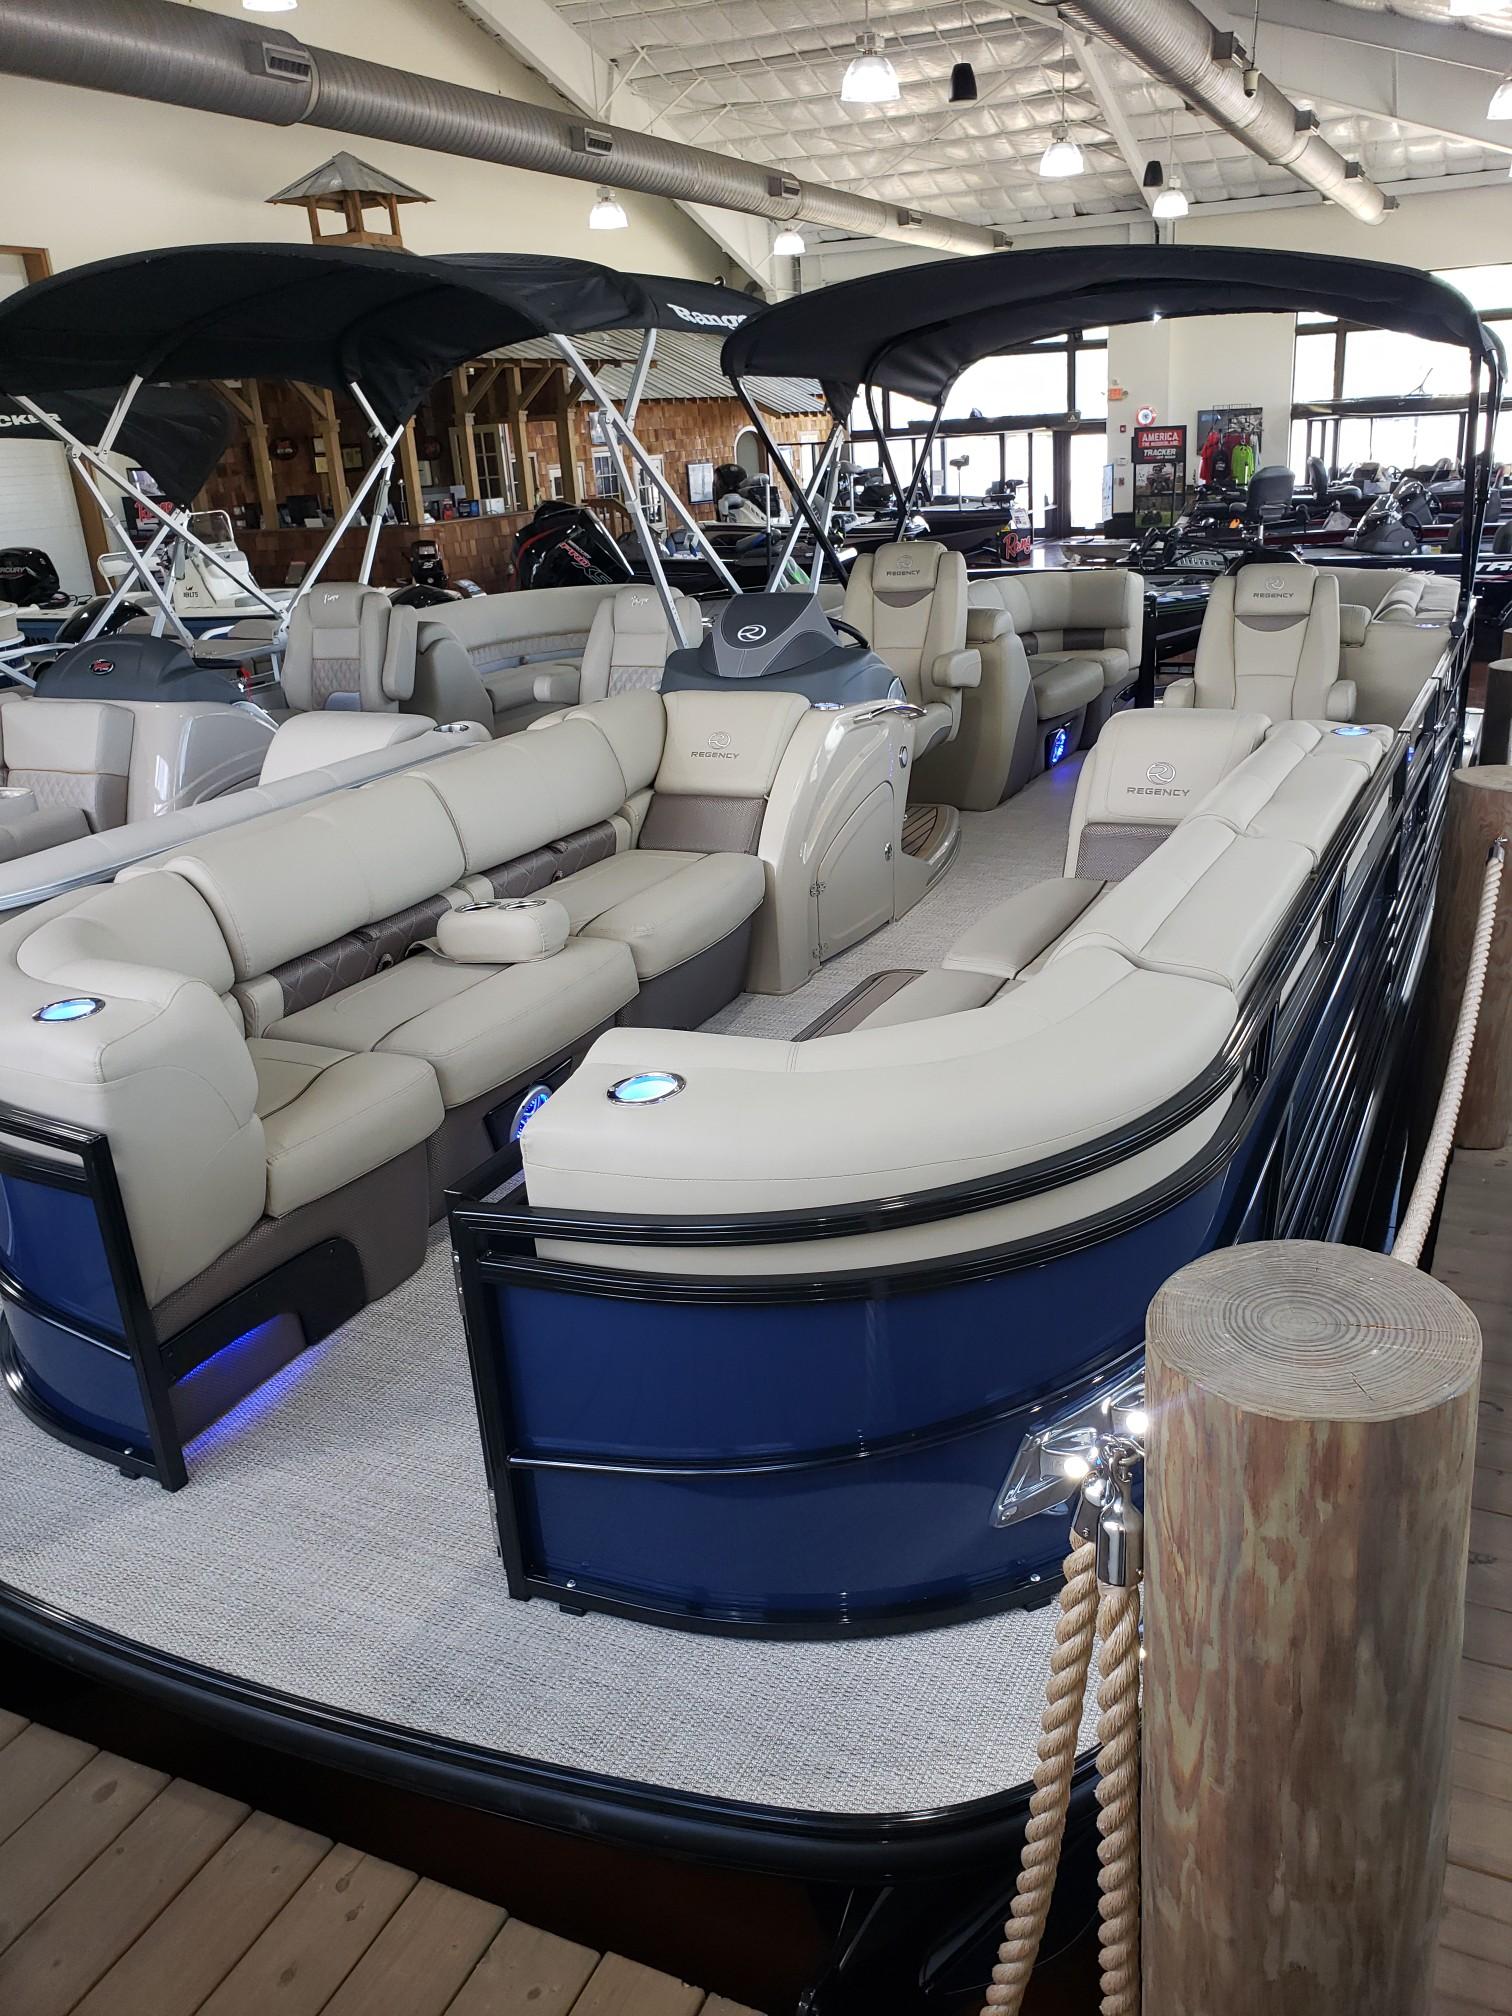 2020 Regency boat for sale, model of the boat is 250 LE3 w/300L Verado & Image # 11 of 27